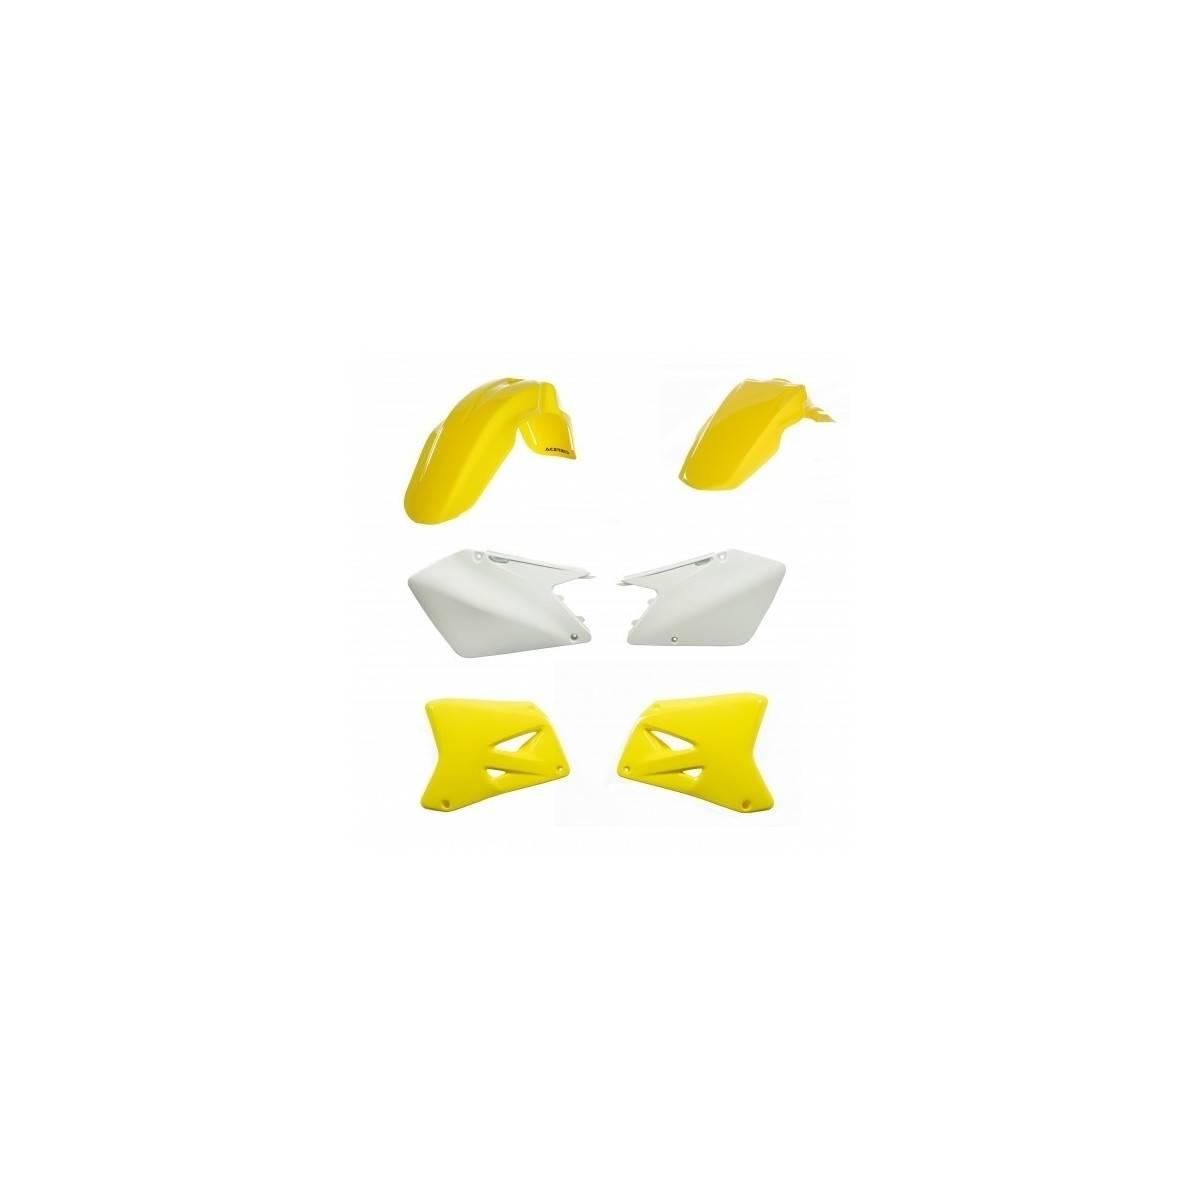 0013776-060 - Kit Plasticos Rmz 250 10 17 Amarillo